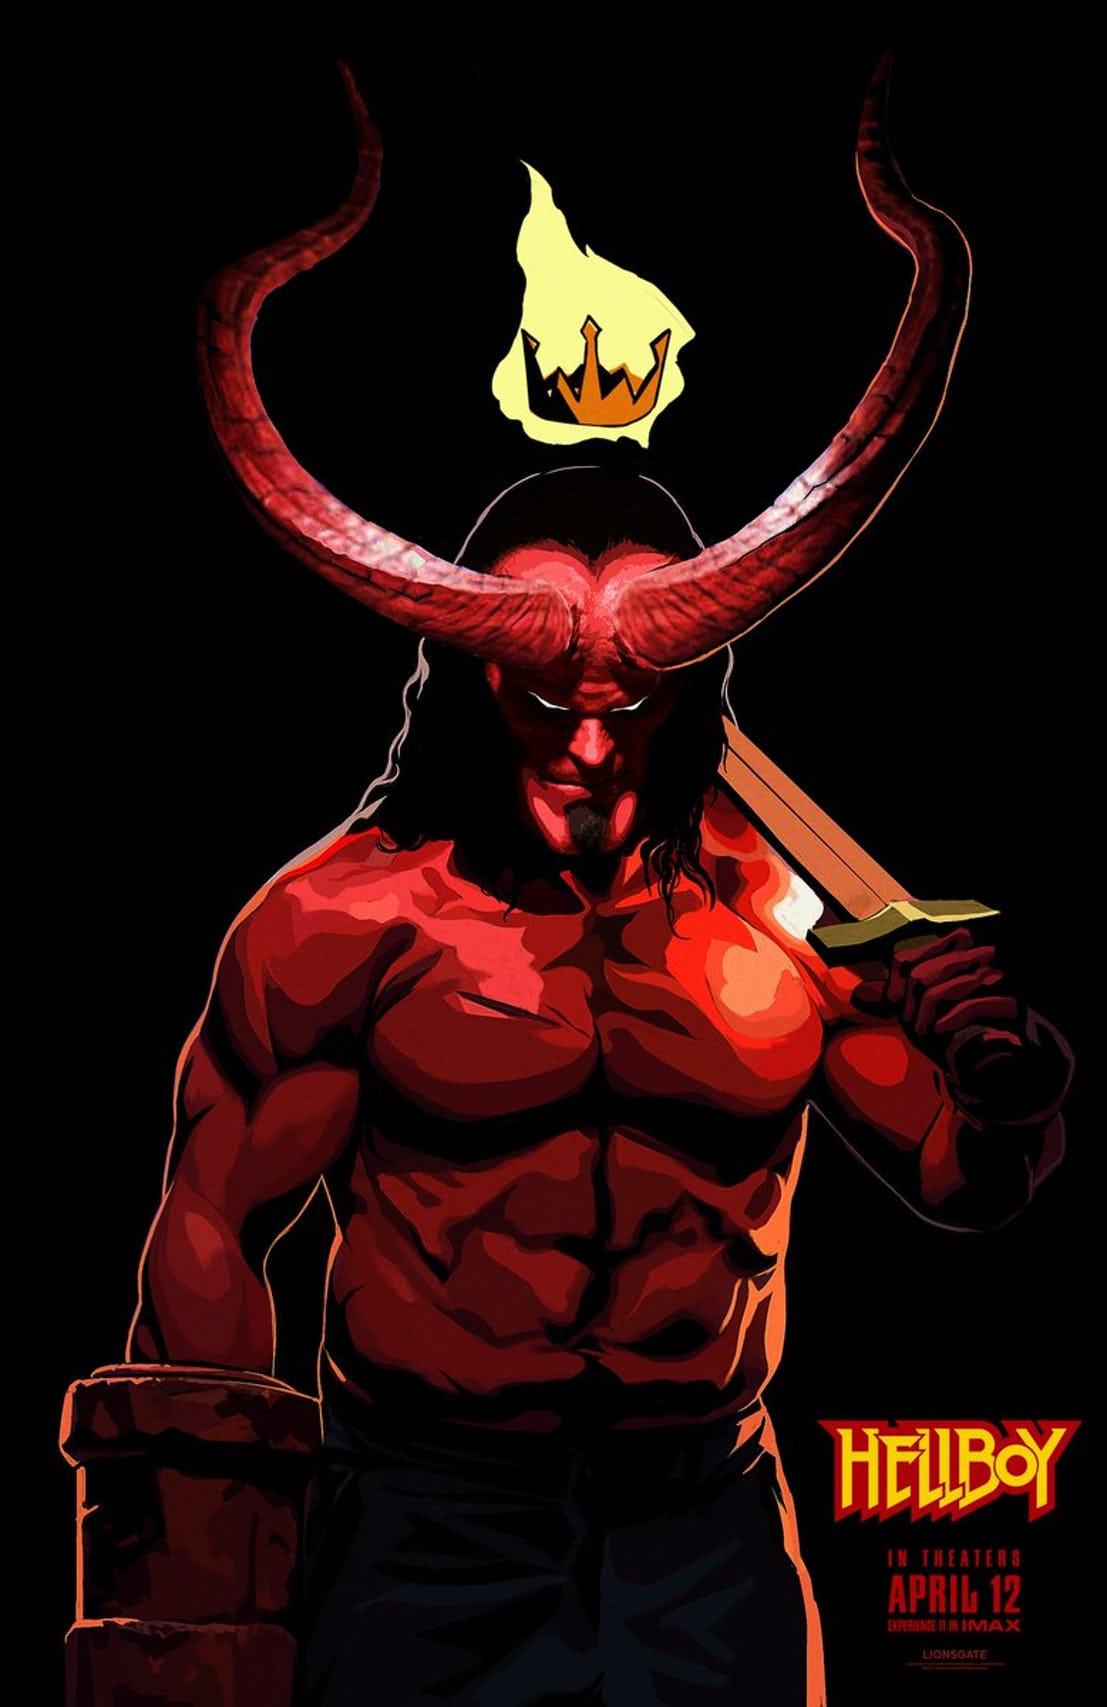 hellboy-poster3-1.jpg